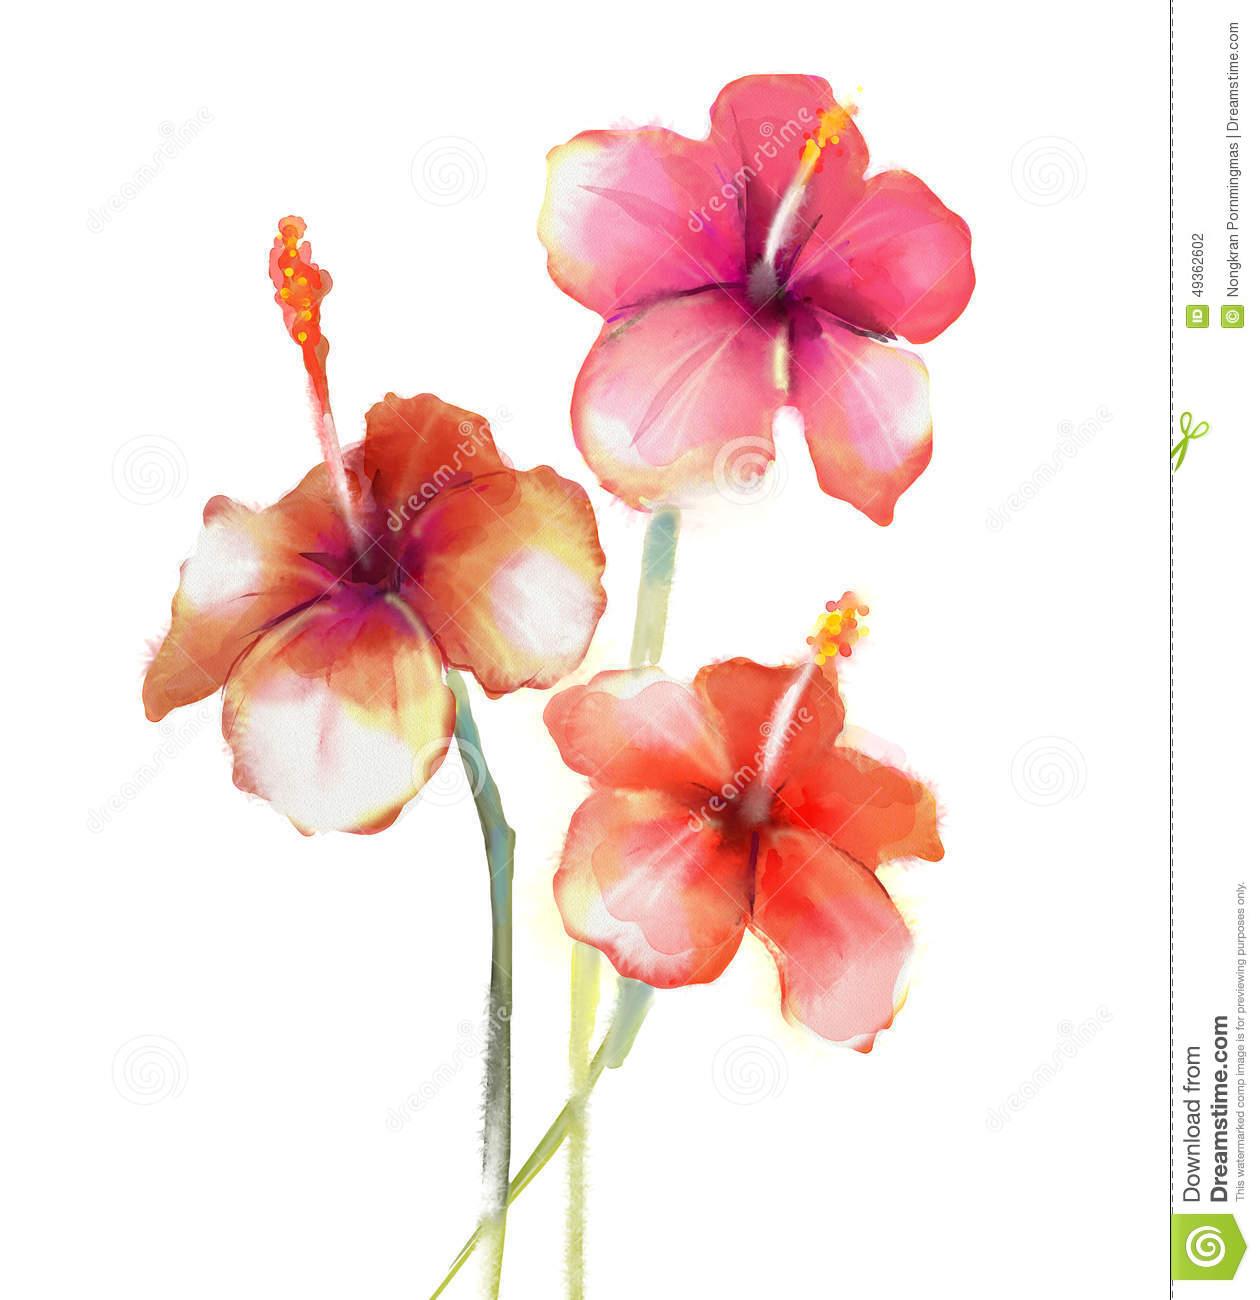 Flower Watercolour Paintings